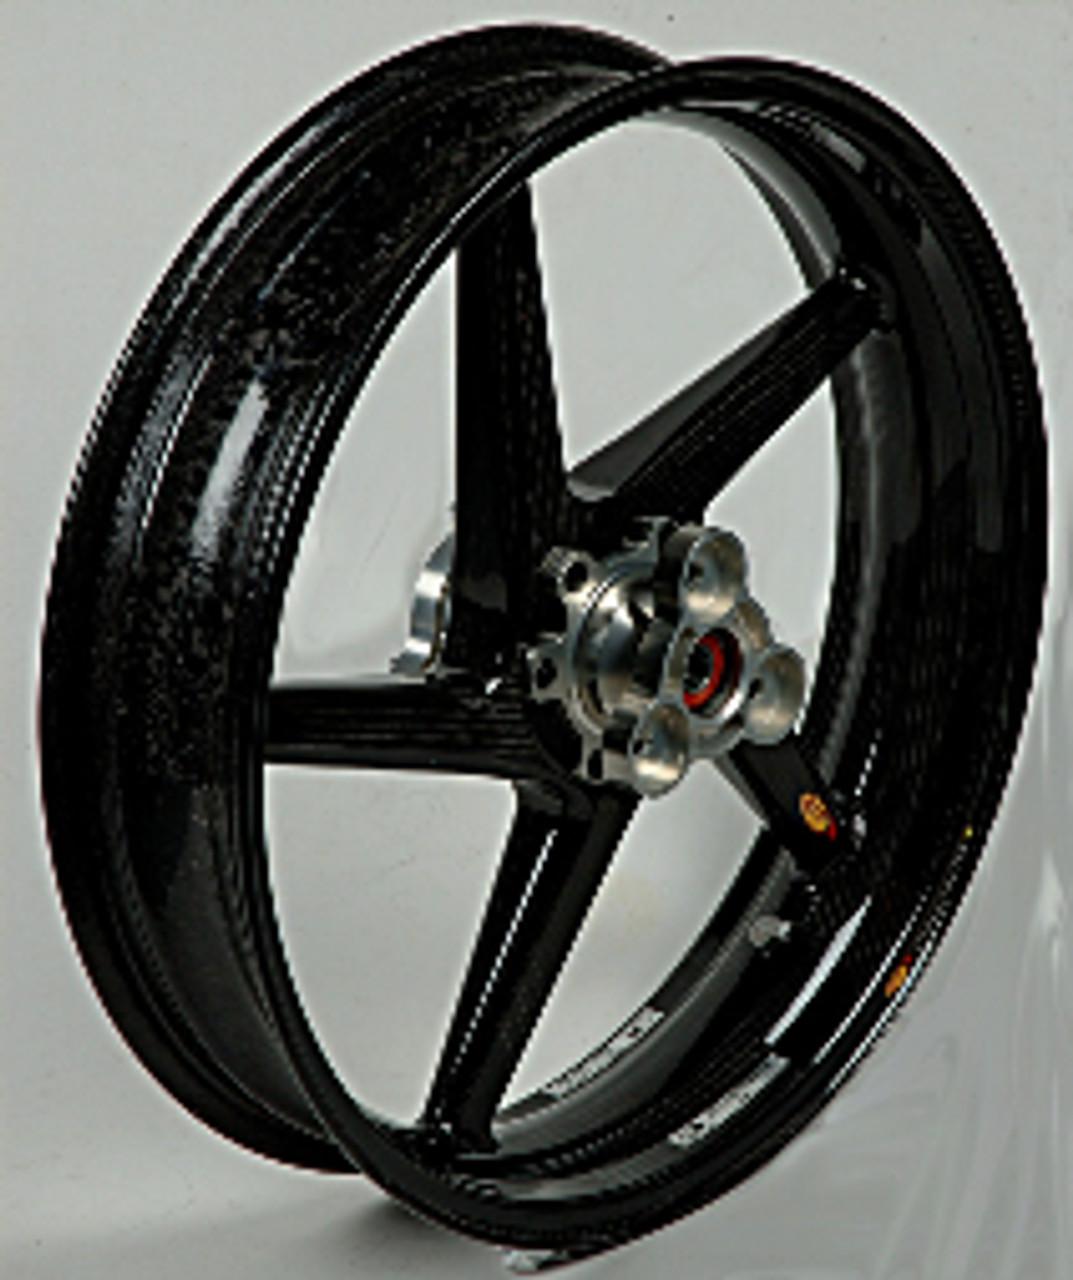 BST  Front Wheel 17 x 3.5 for Kawasaki ZX14 2006-2017, ZX10R 2006-2015, ZX6R 2005-2017